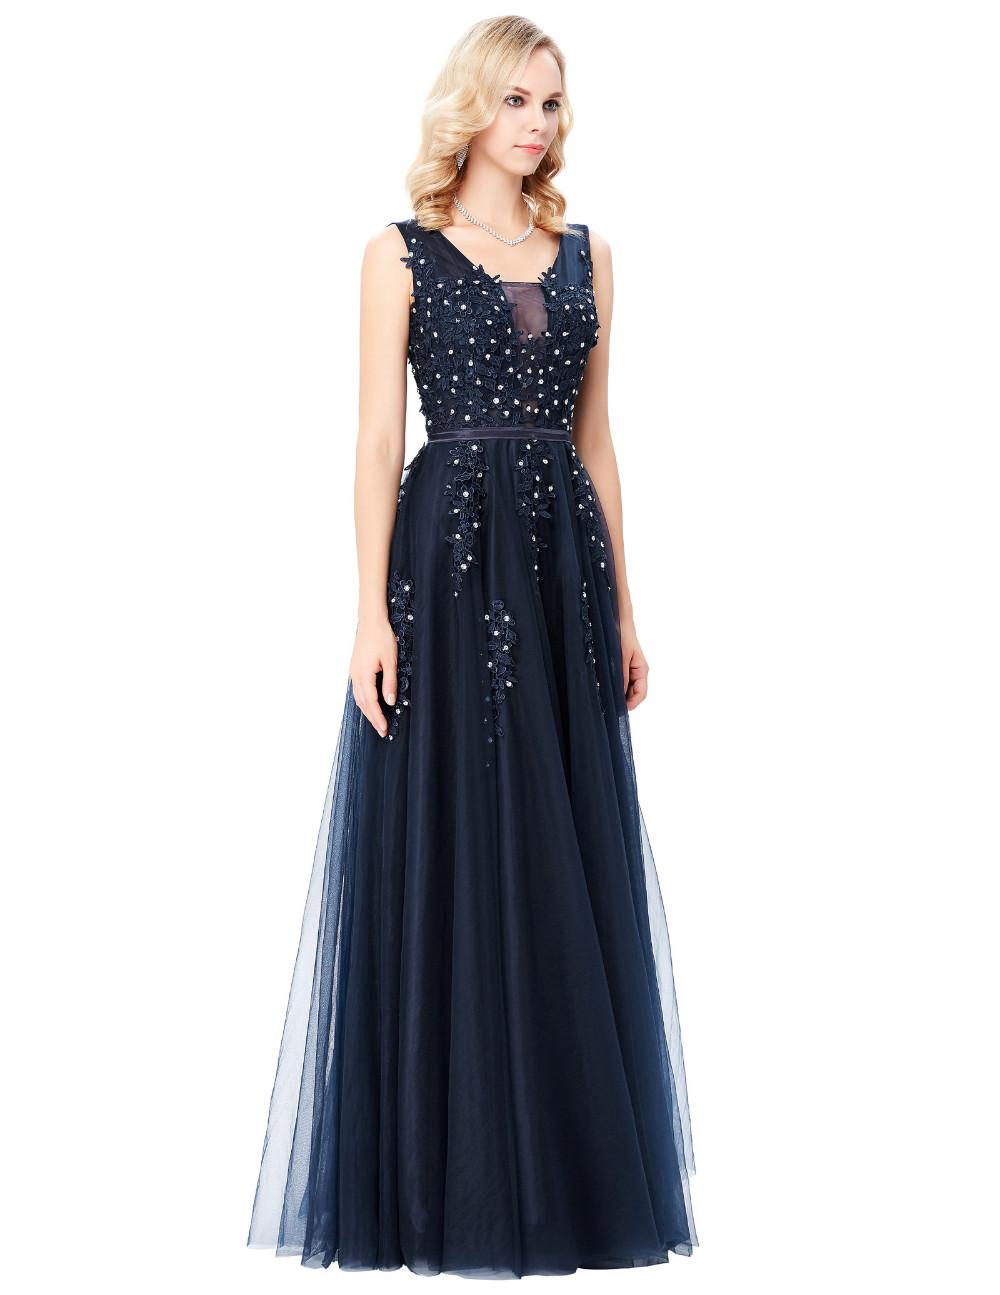 Grace Karin Tulle Appliques Celebrity Prom Dress Sexy V Back Sleeveless Long Royal Blue Robes De Soiree 2017 Longue Prom Dresses 8